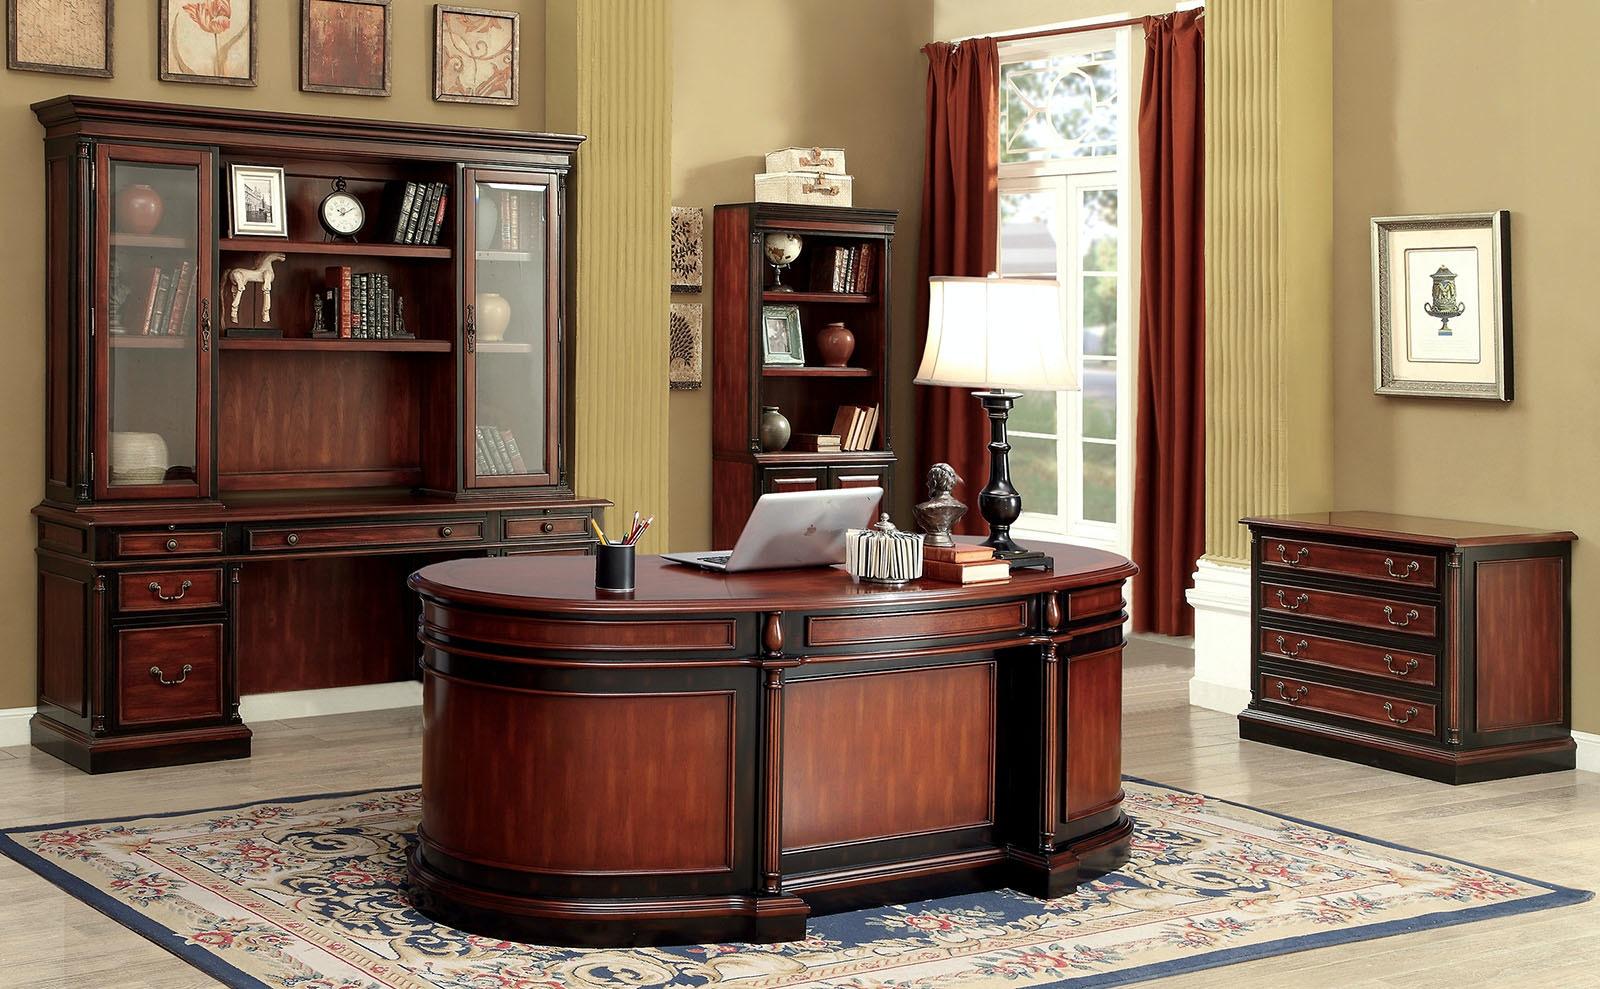 oval office furniture. Furniture Of America Oval Office Desk CM-DK6255DO I